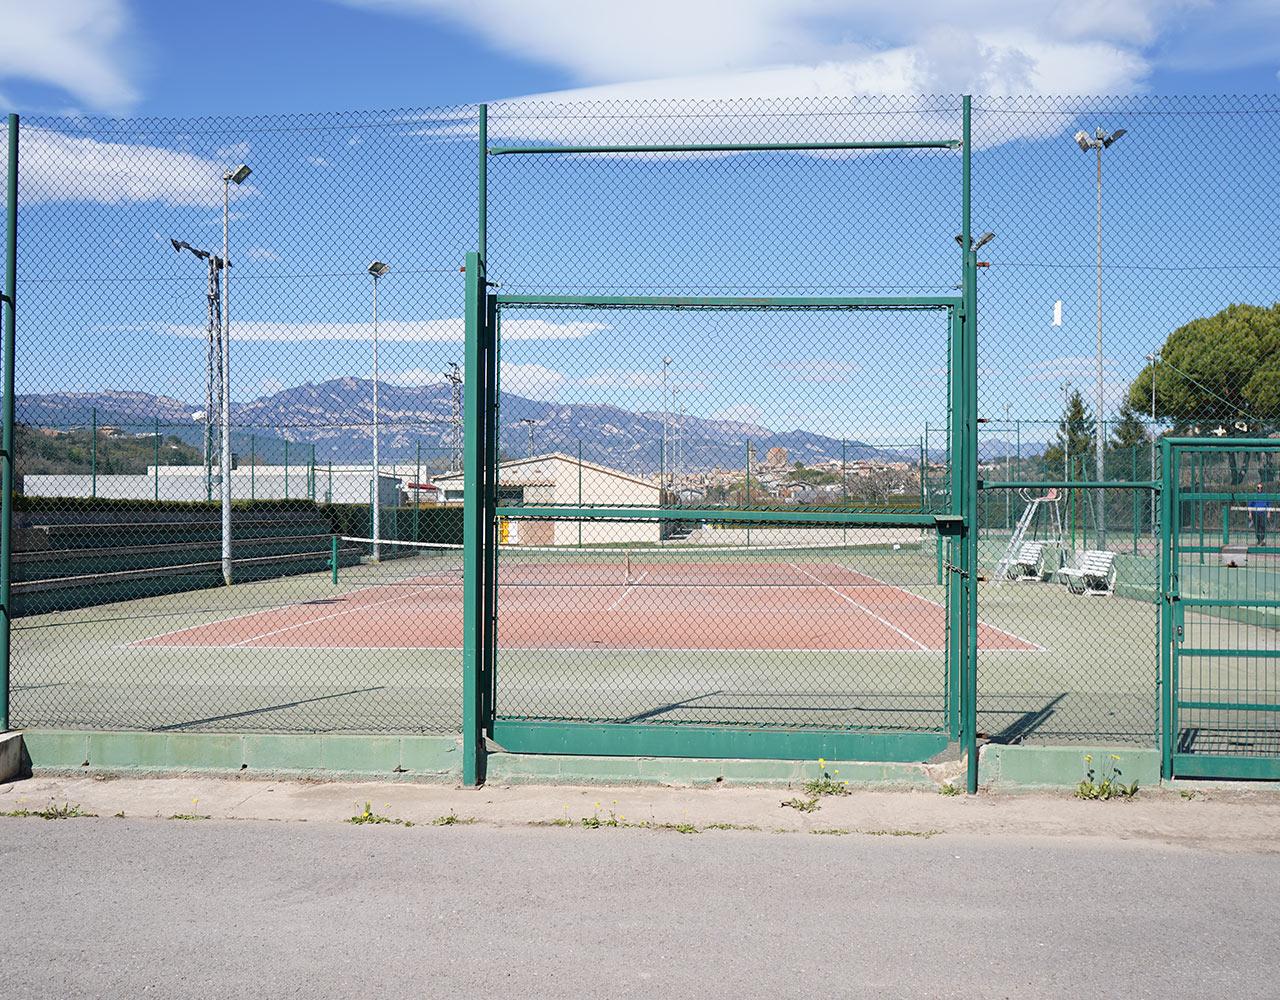 destacat-tennis